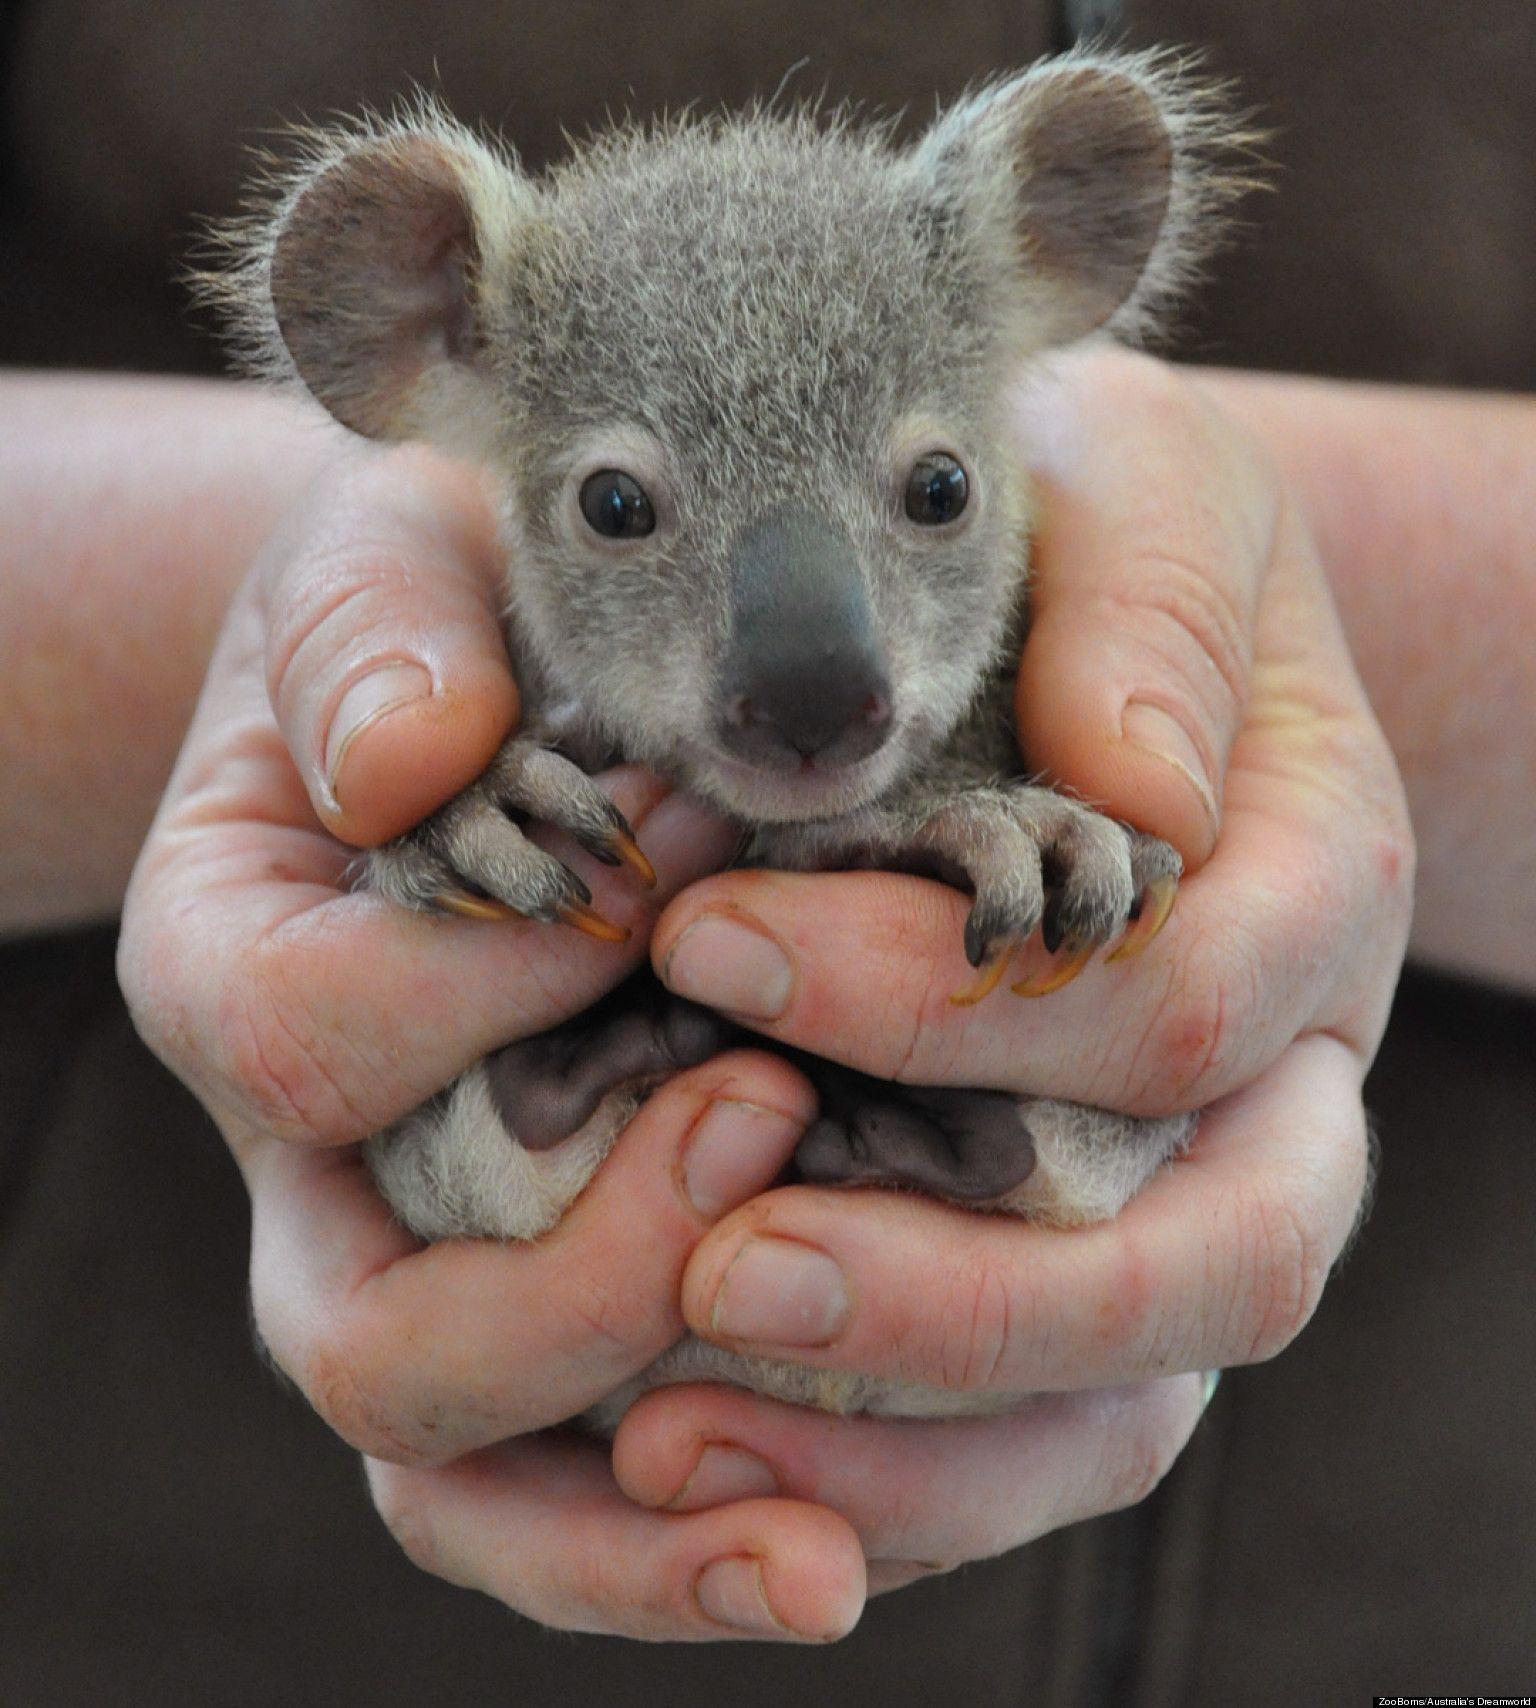 PHOTOS: ZooBorns' 25 Cutest Baby Animals | Baby polar bears ...